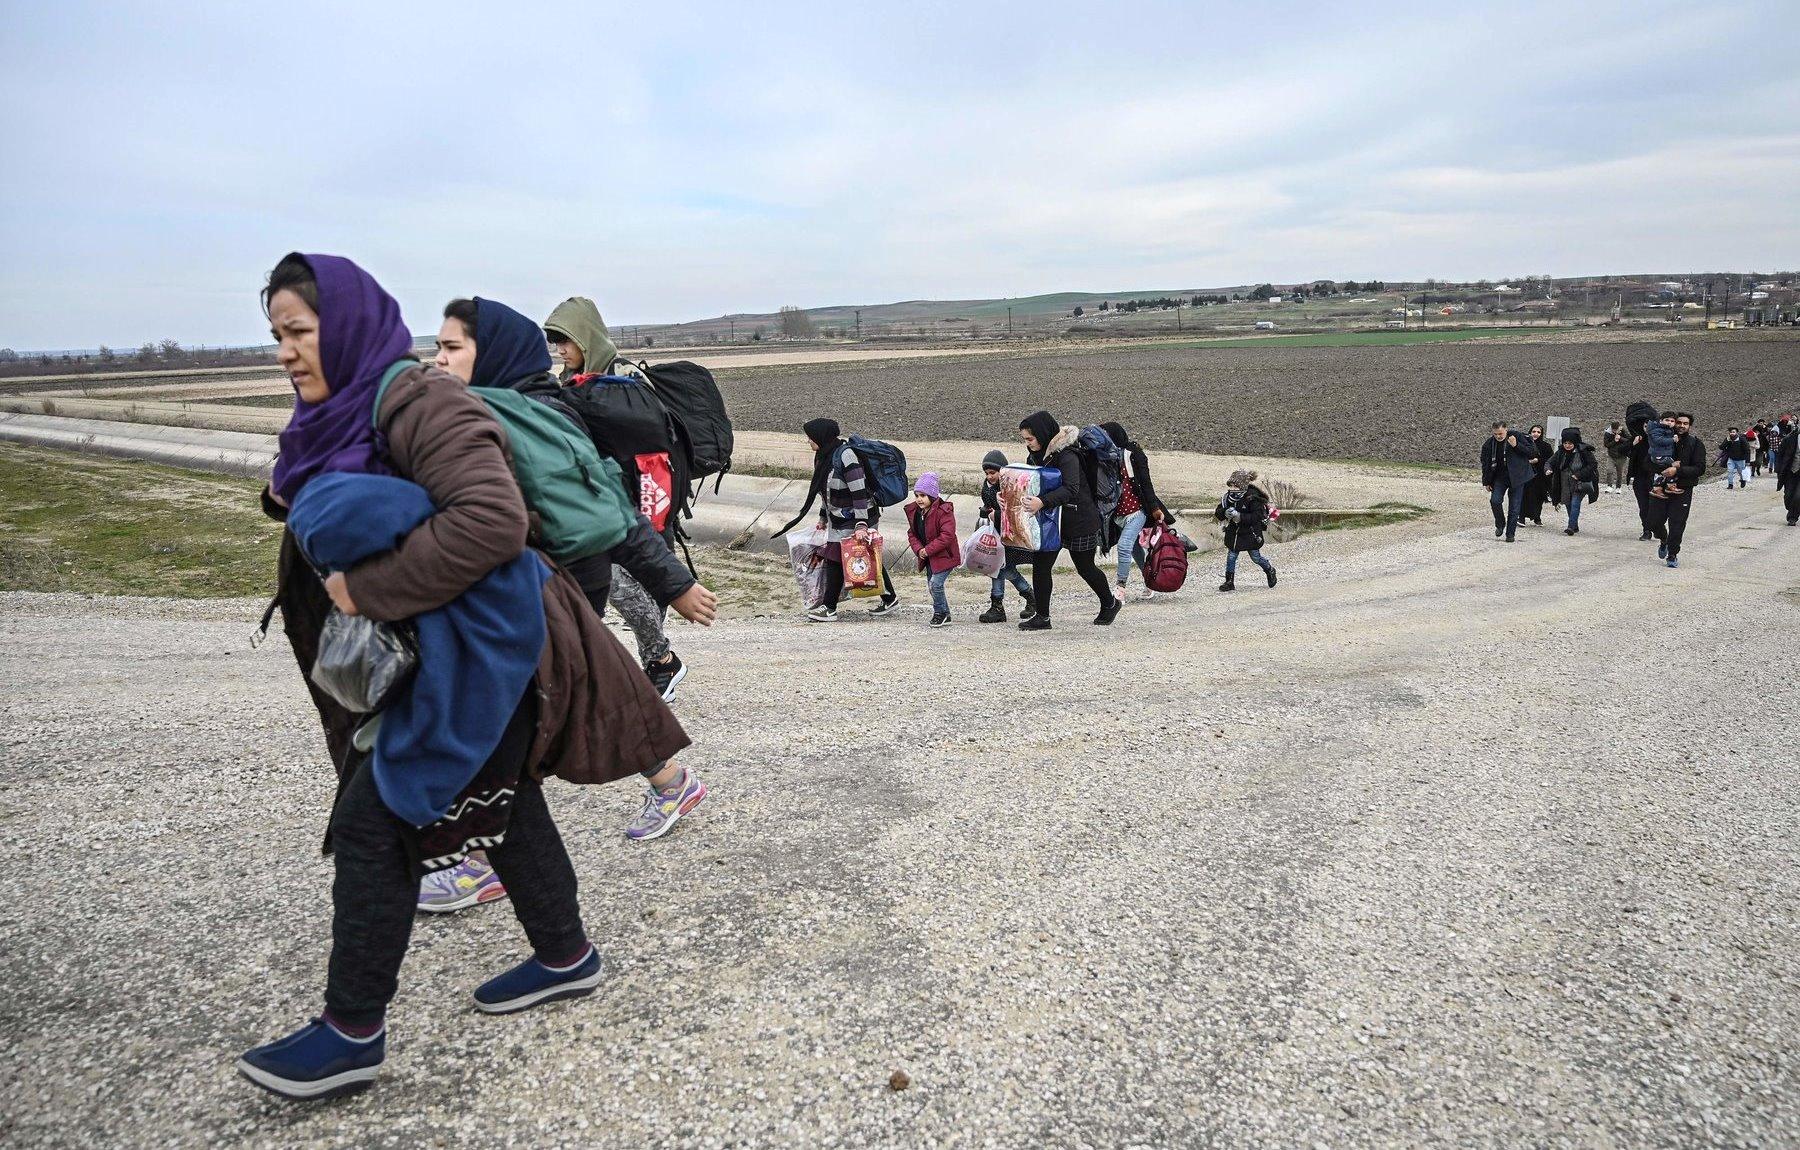 coronavirus vs Syrian refugee crisis